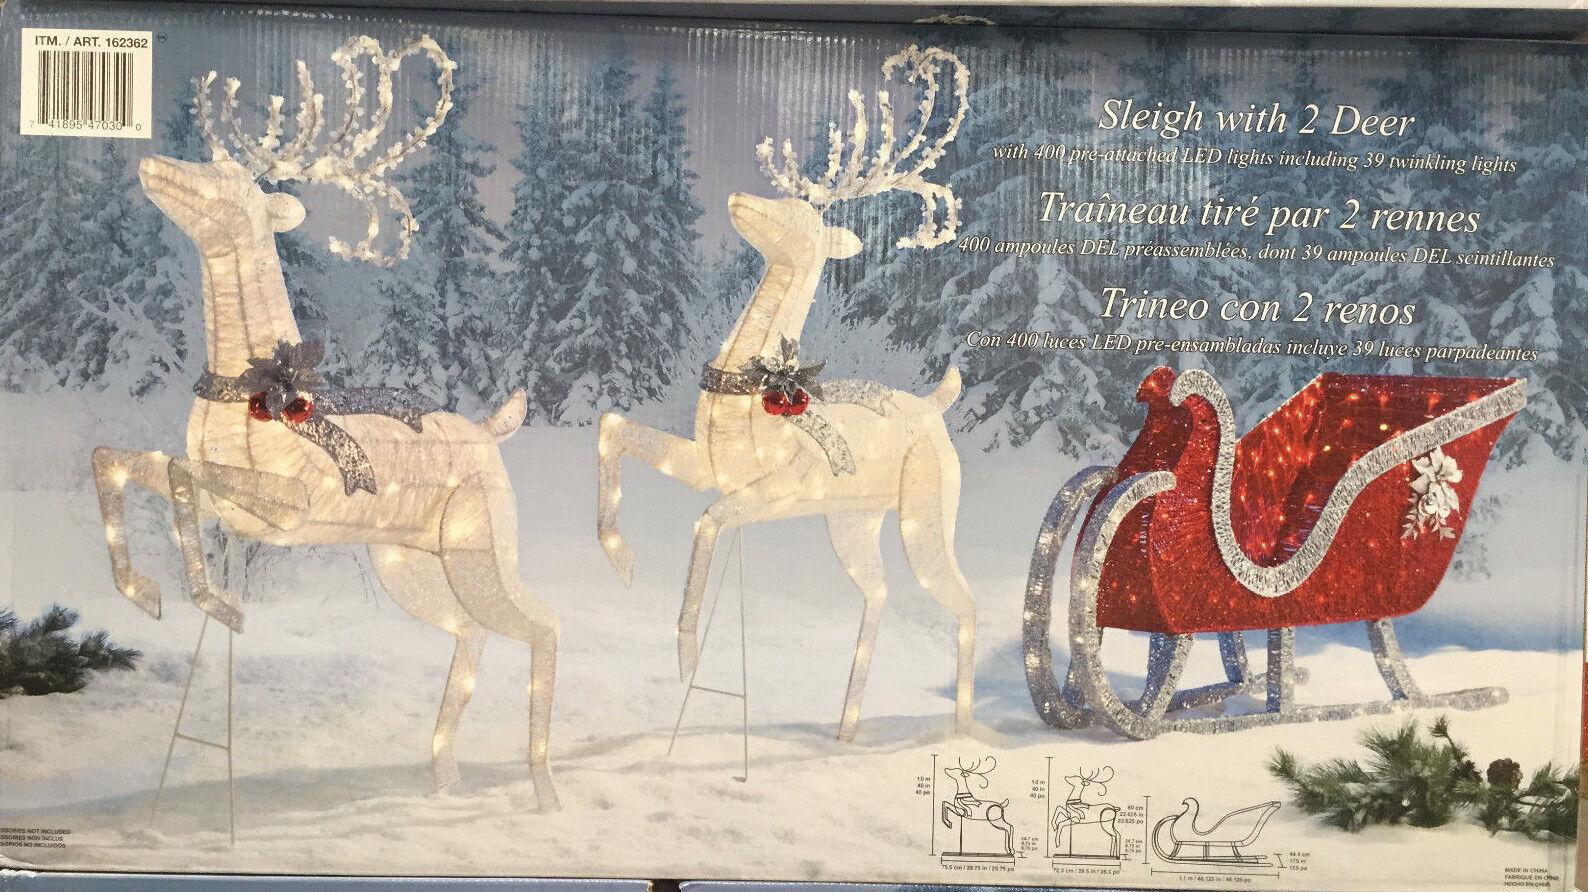 reindeer sleigh 400 led lights indoor outdoor garden. Black Bedroom Furniture Sets. Home Design Ideas